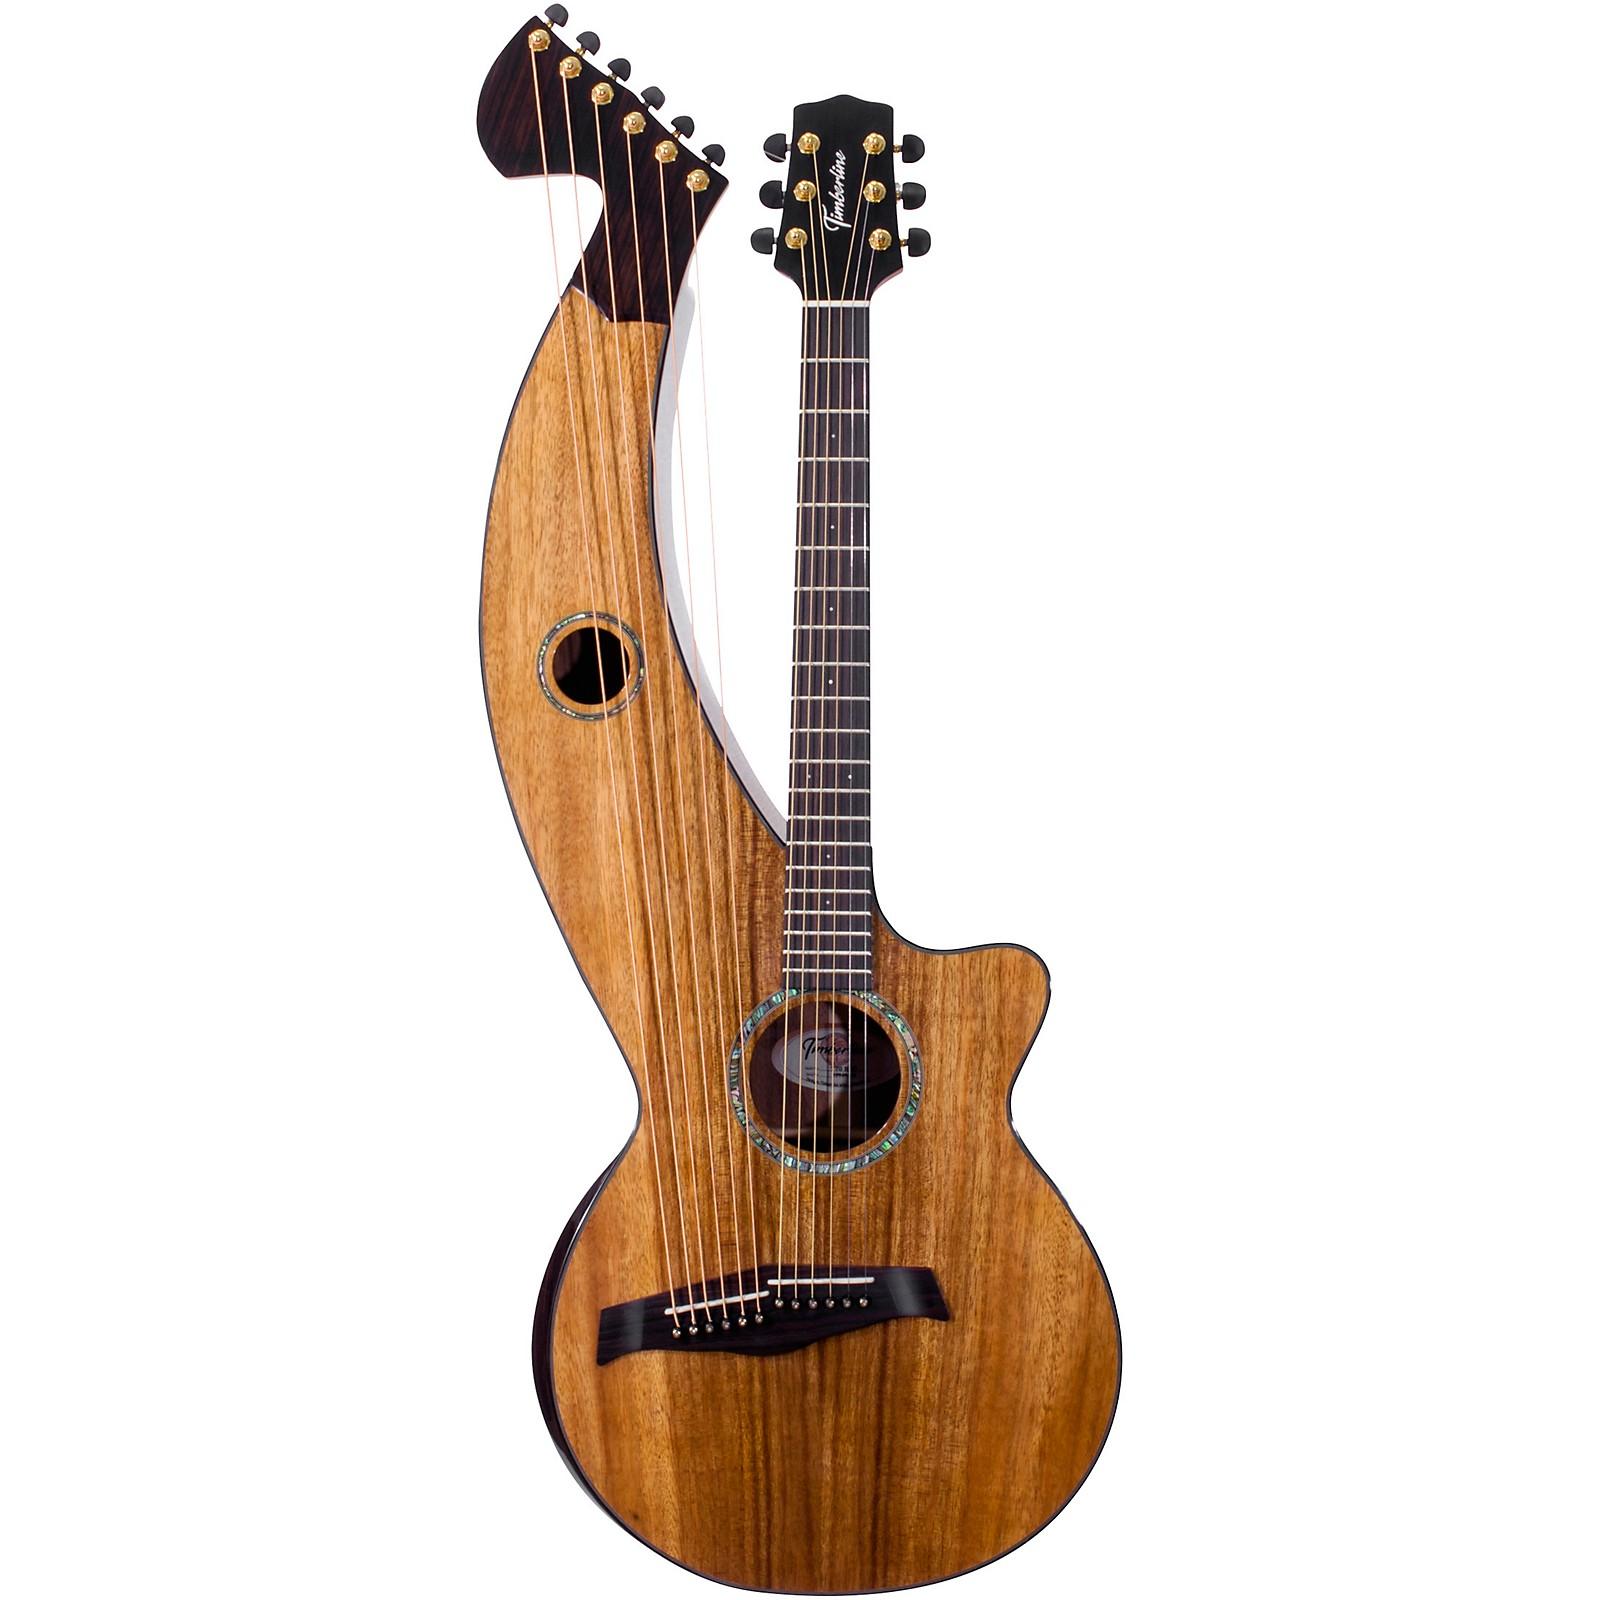 Timberline Guitars T70HGc Solid Silkwood 12-String Cutaway Acoustic-Electric Harp Guitar